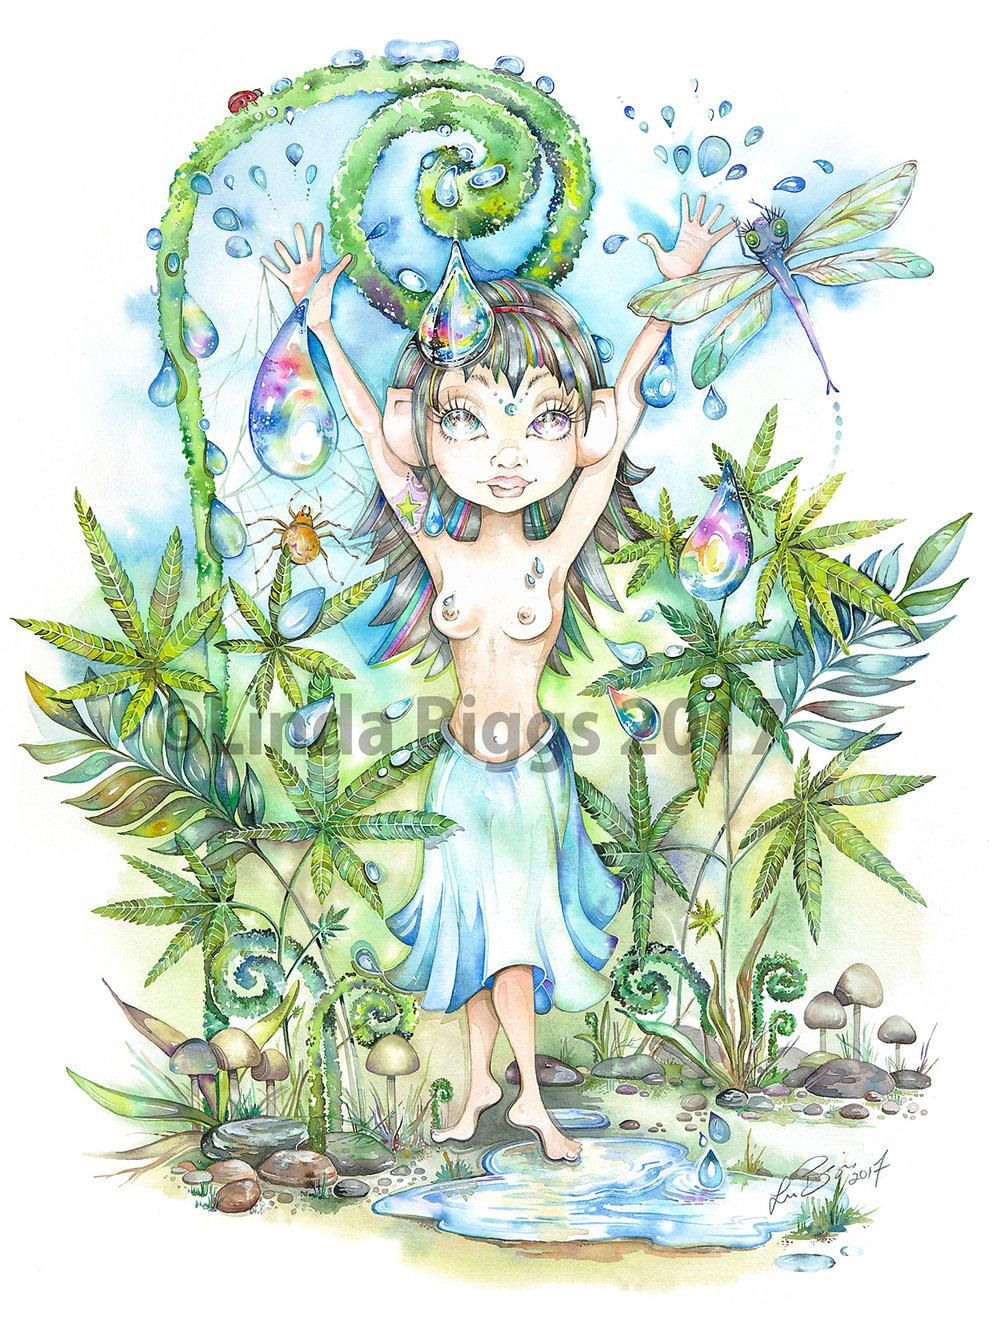 Cannabis Queen